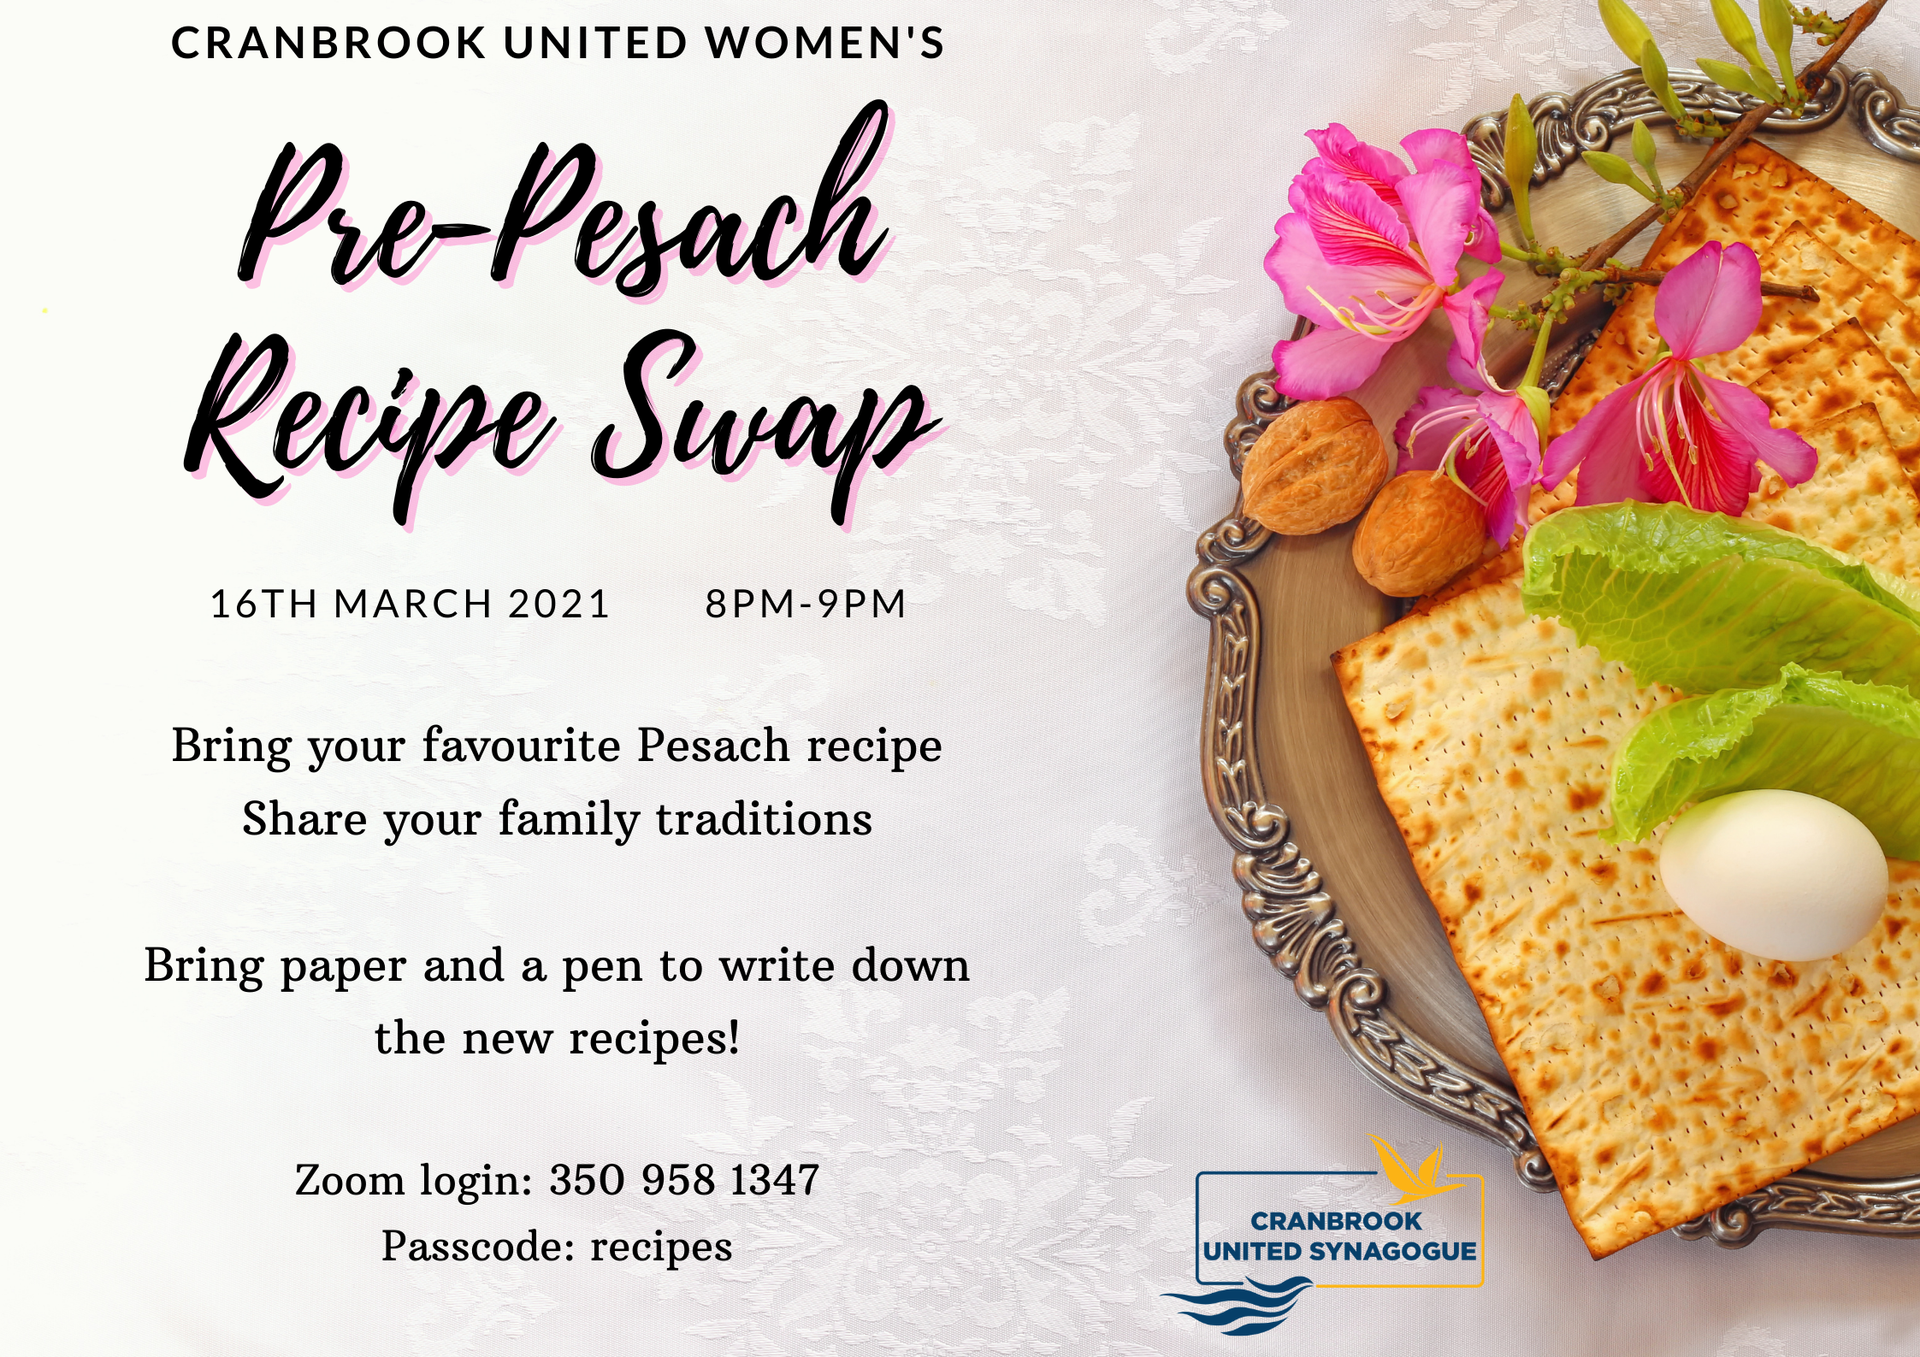 Pre-Pesach Recipe Swap